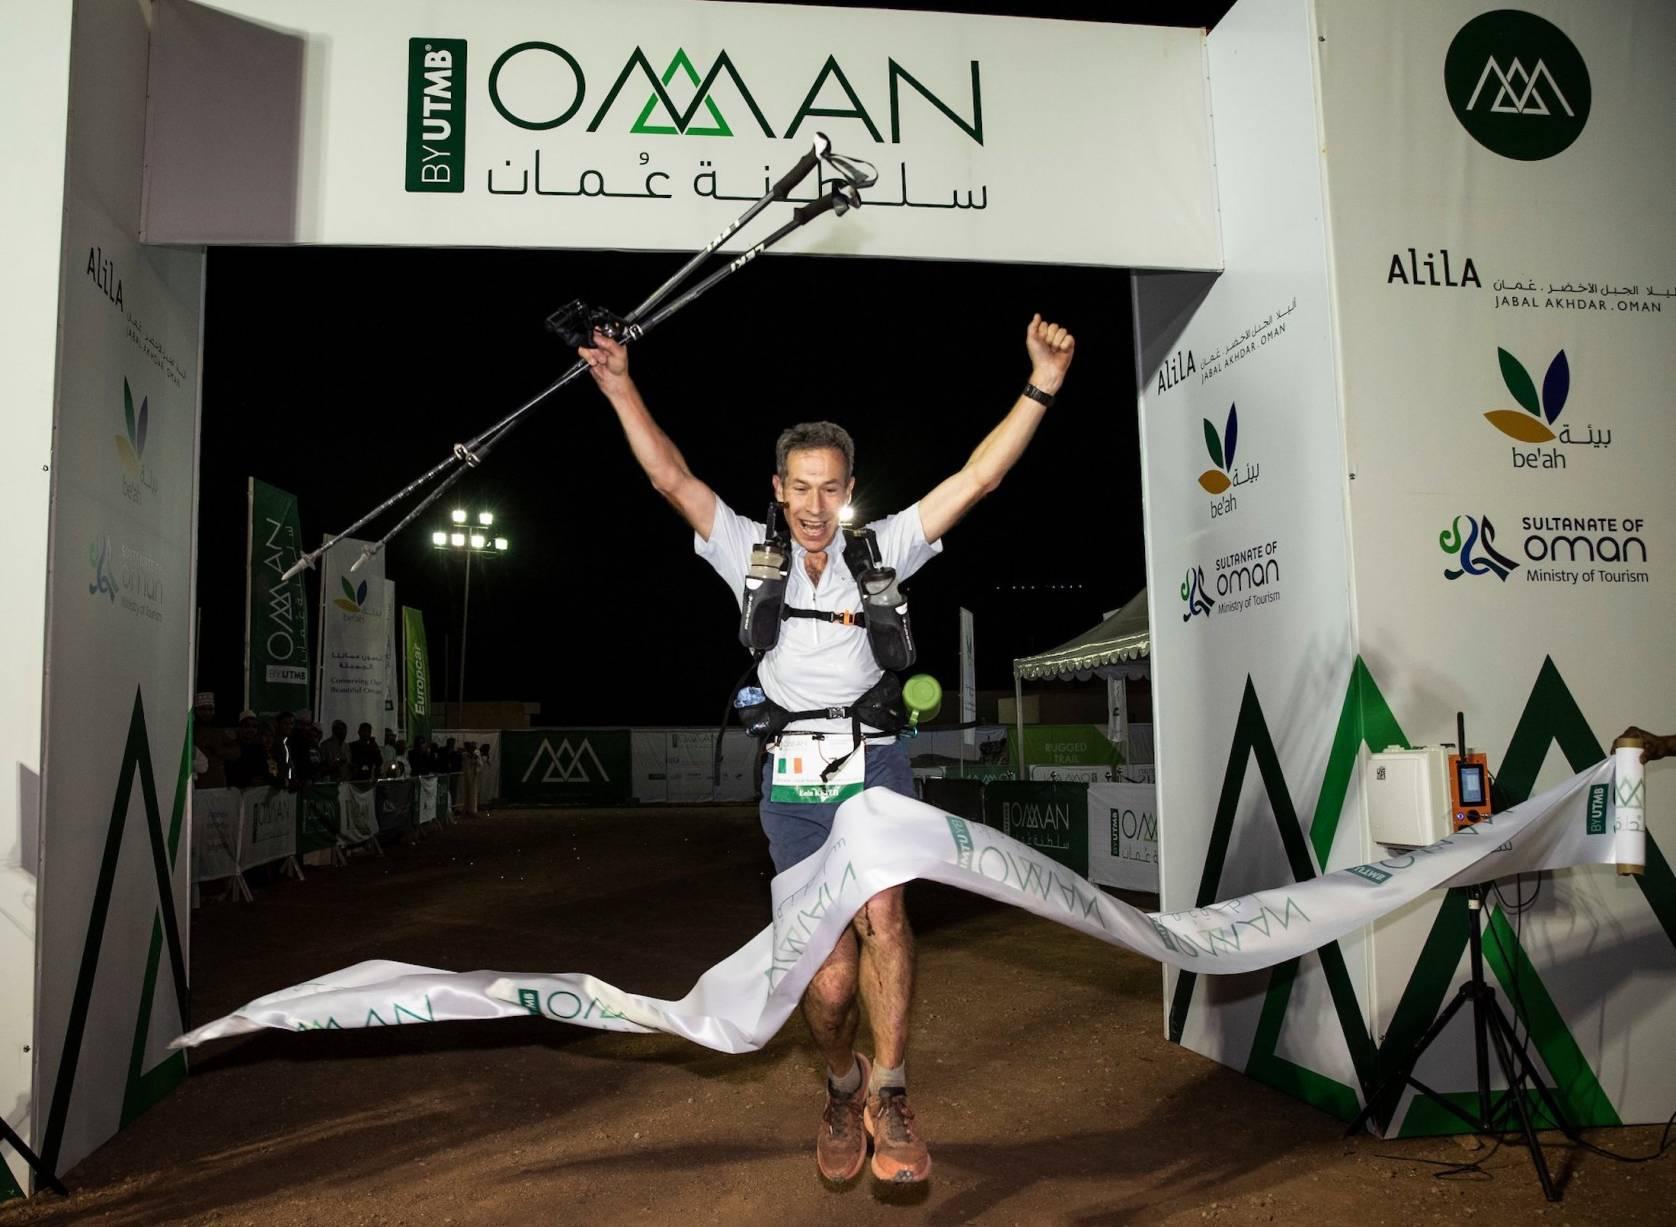 Men's winner of the 170 km race crosses finish line in Oman